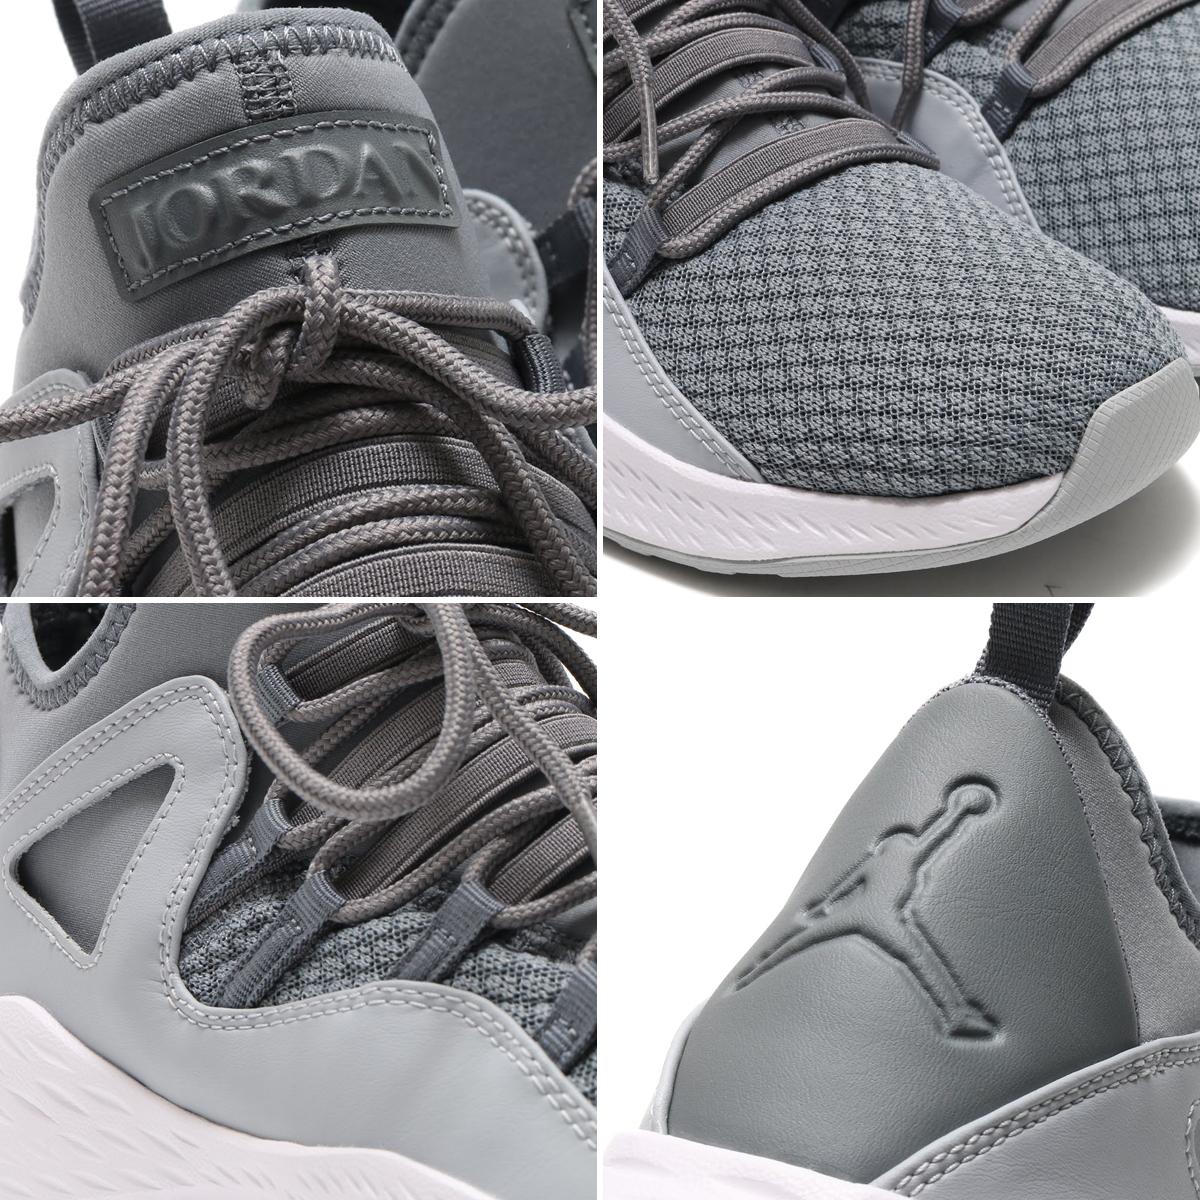 65ee4e84d97b65 NIKE JORDAN FORMULA 23 (COOL GREY COOL GREY-WHITE-WOLF GREY) (Nike Jordan  formula 23)